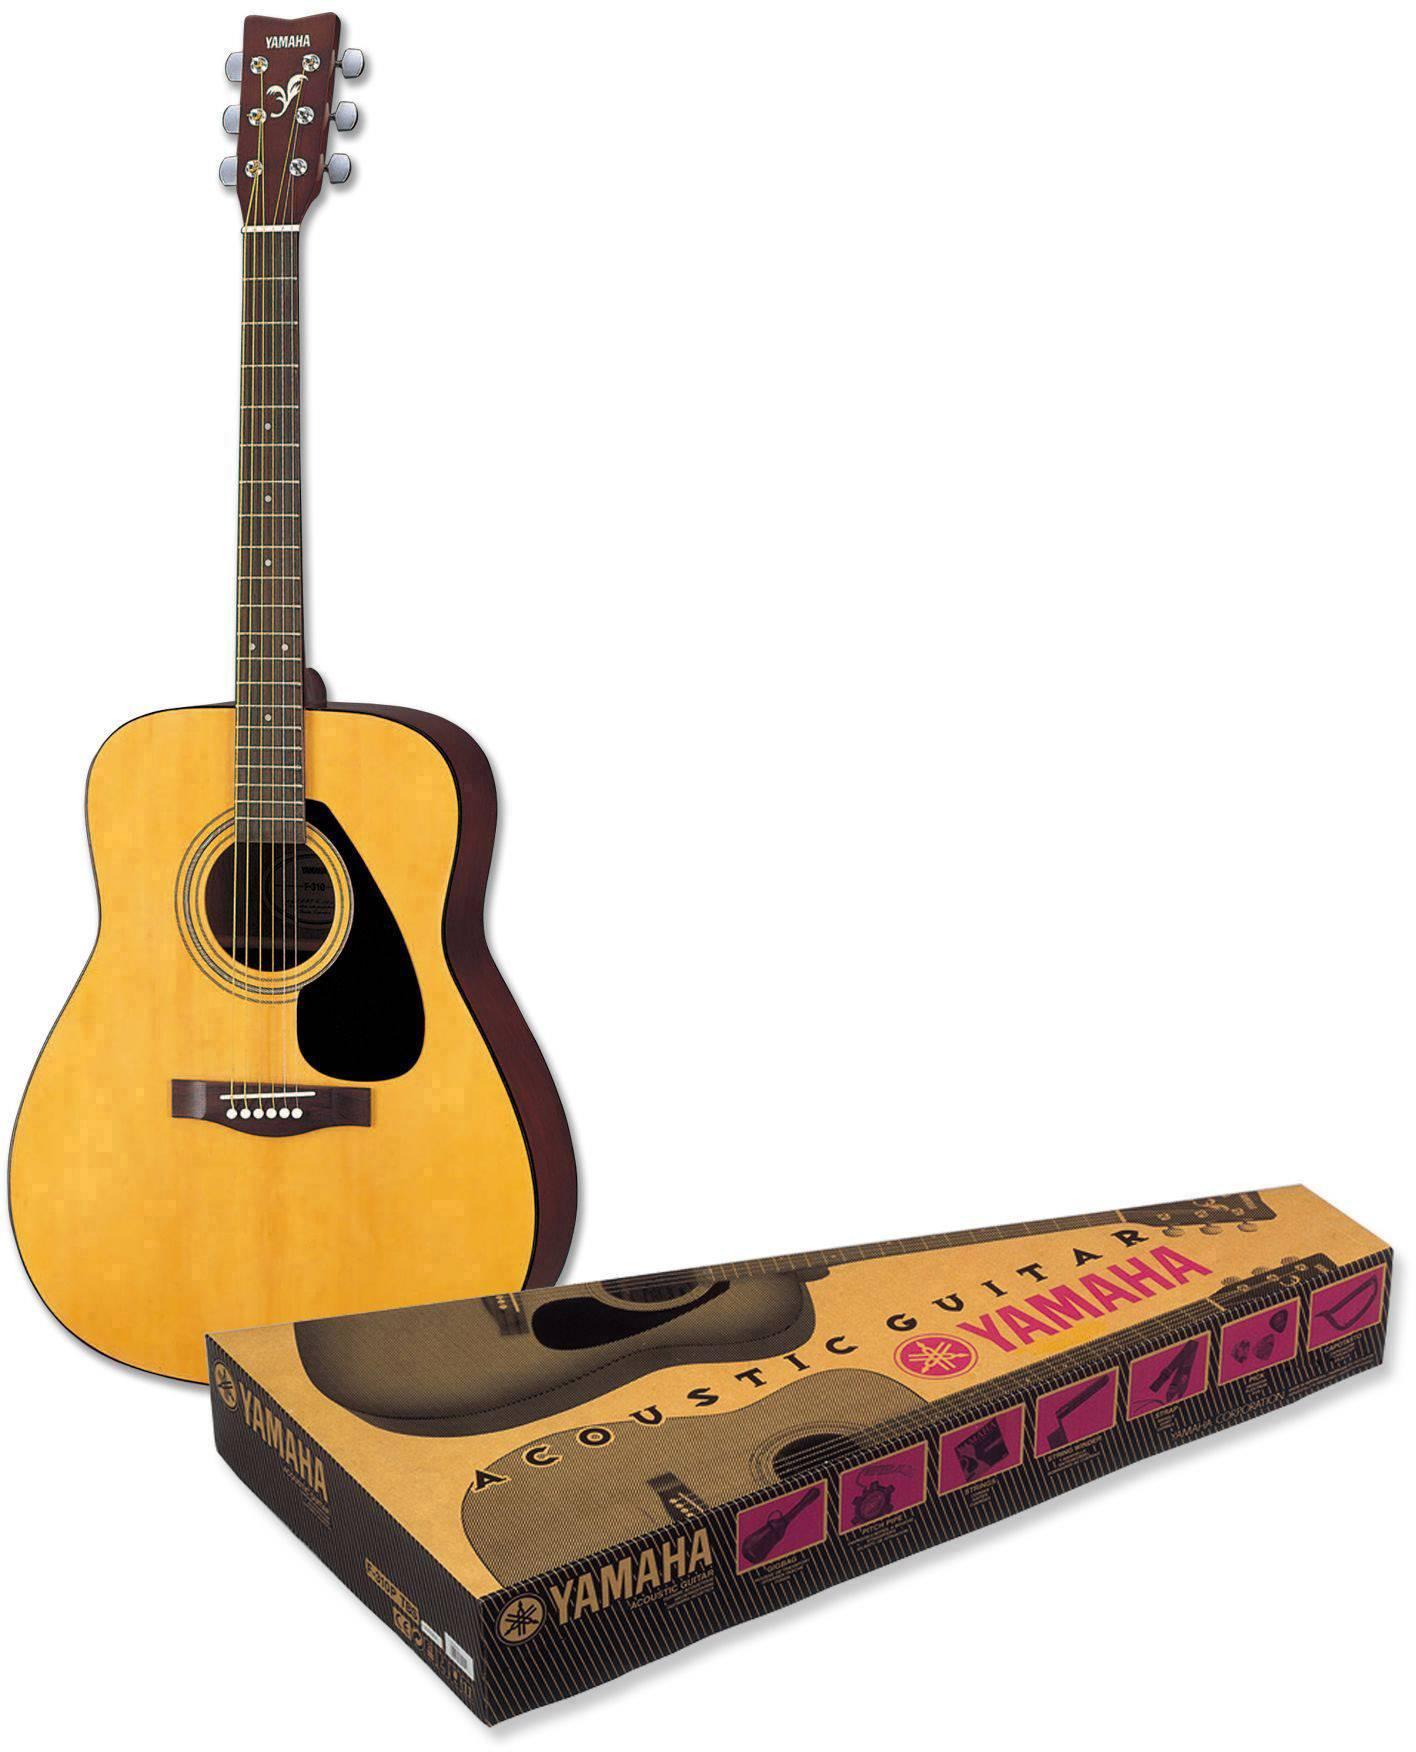 Kit chitarra folk Yamaha F 310P 4/4 Legno Incl. Custodia